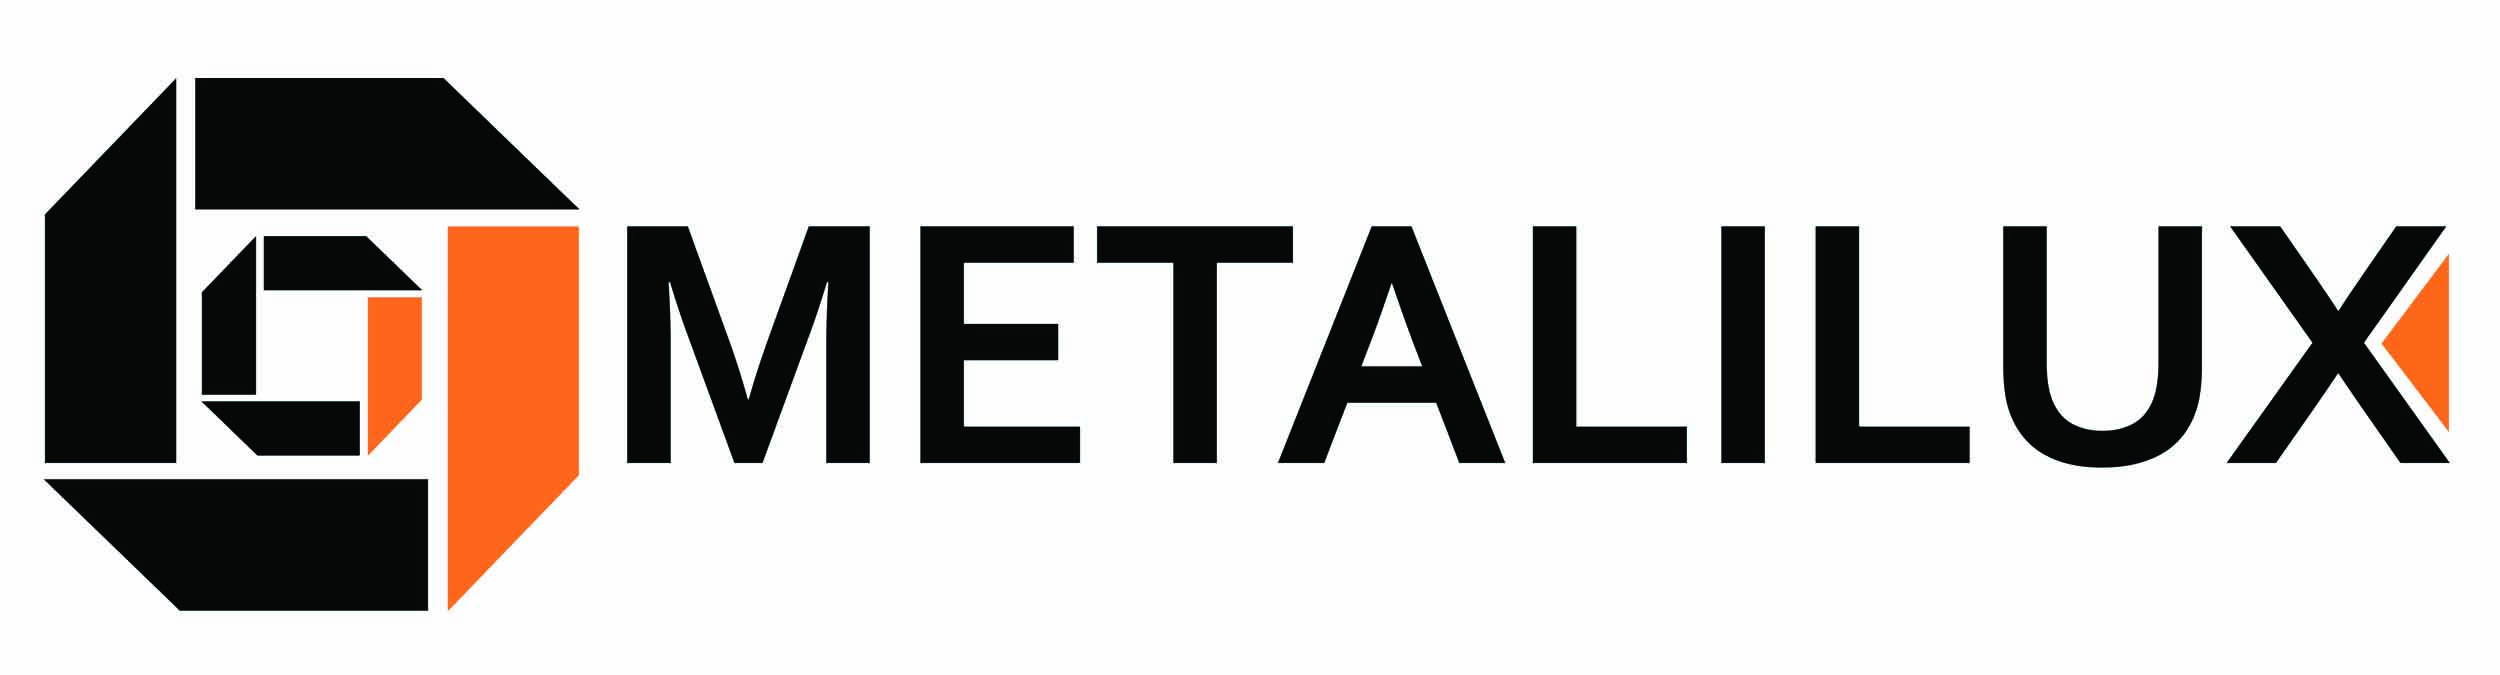 Metalilux